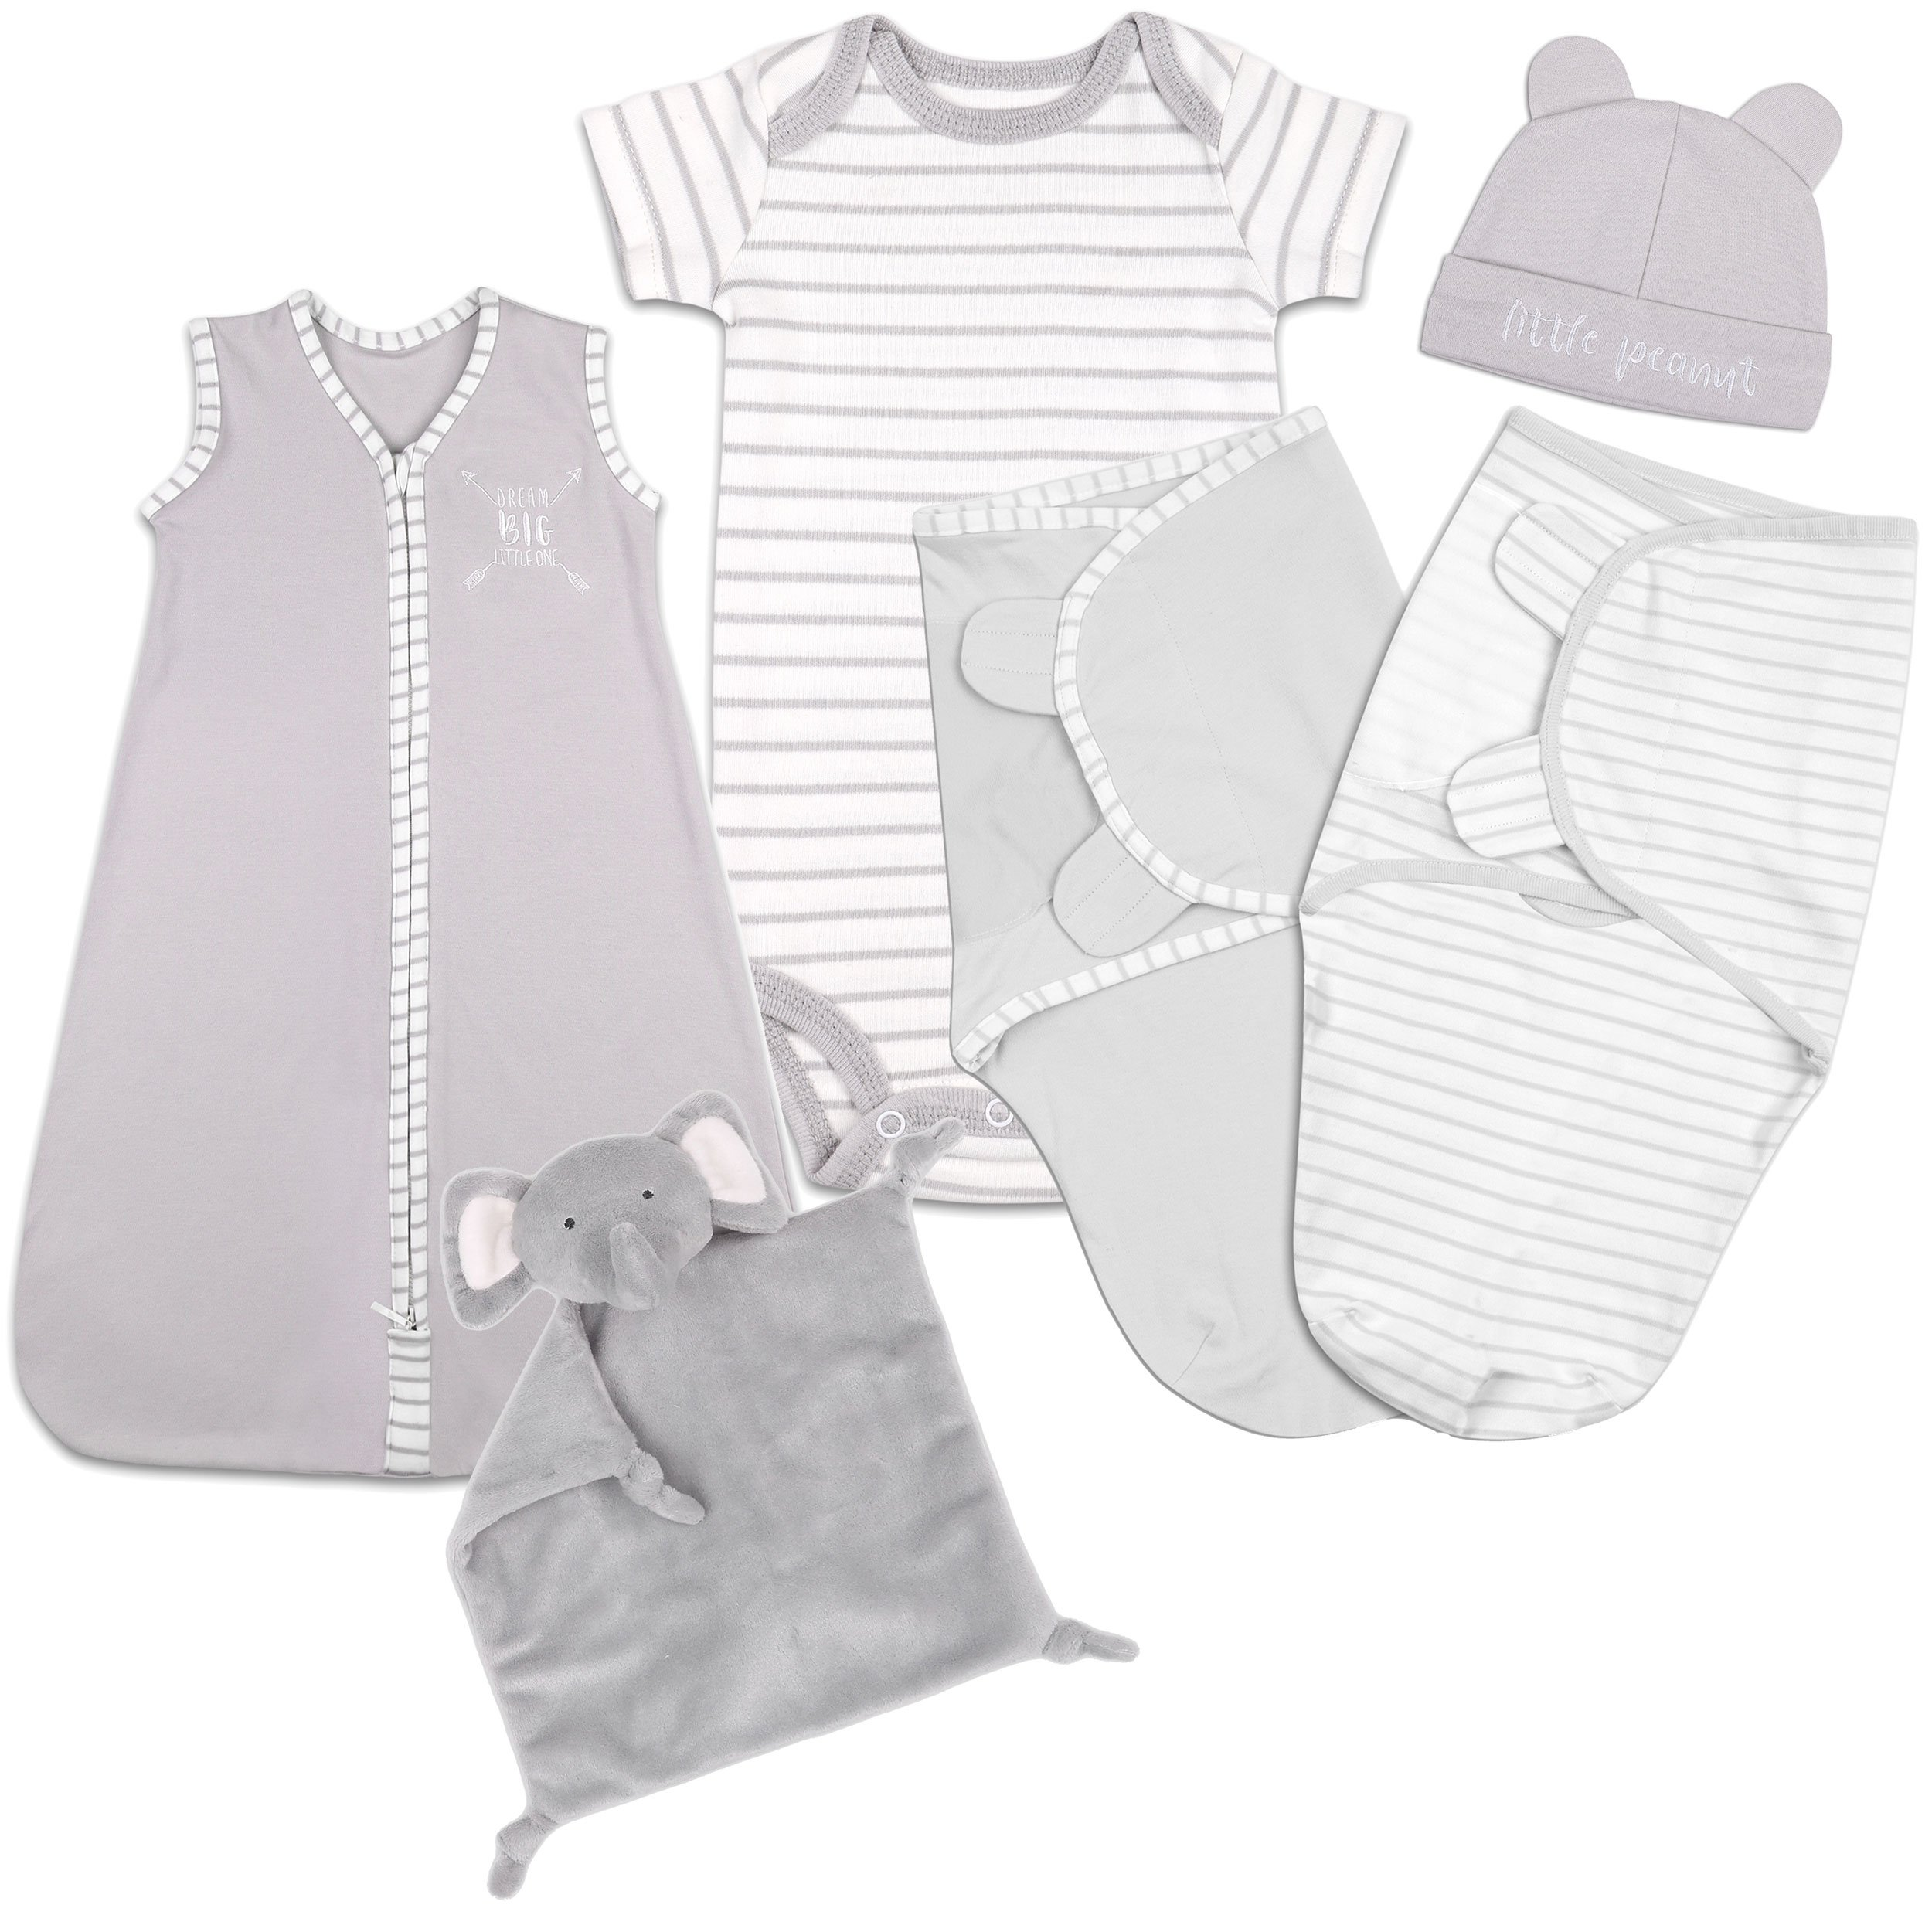 Baby Layette Gift Set - Grey Sleep Bag, Swaddles, Bodysuit, Hat, and Blanket